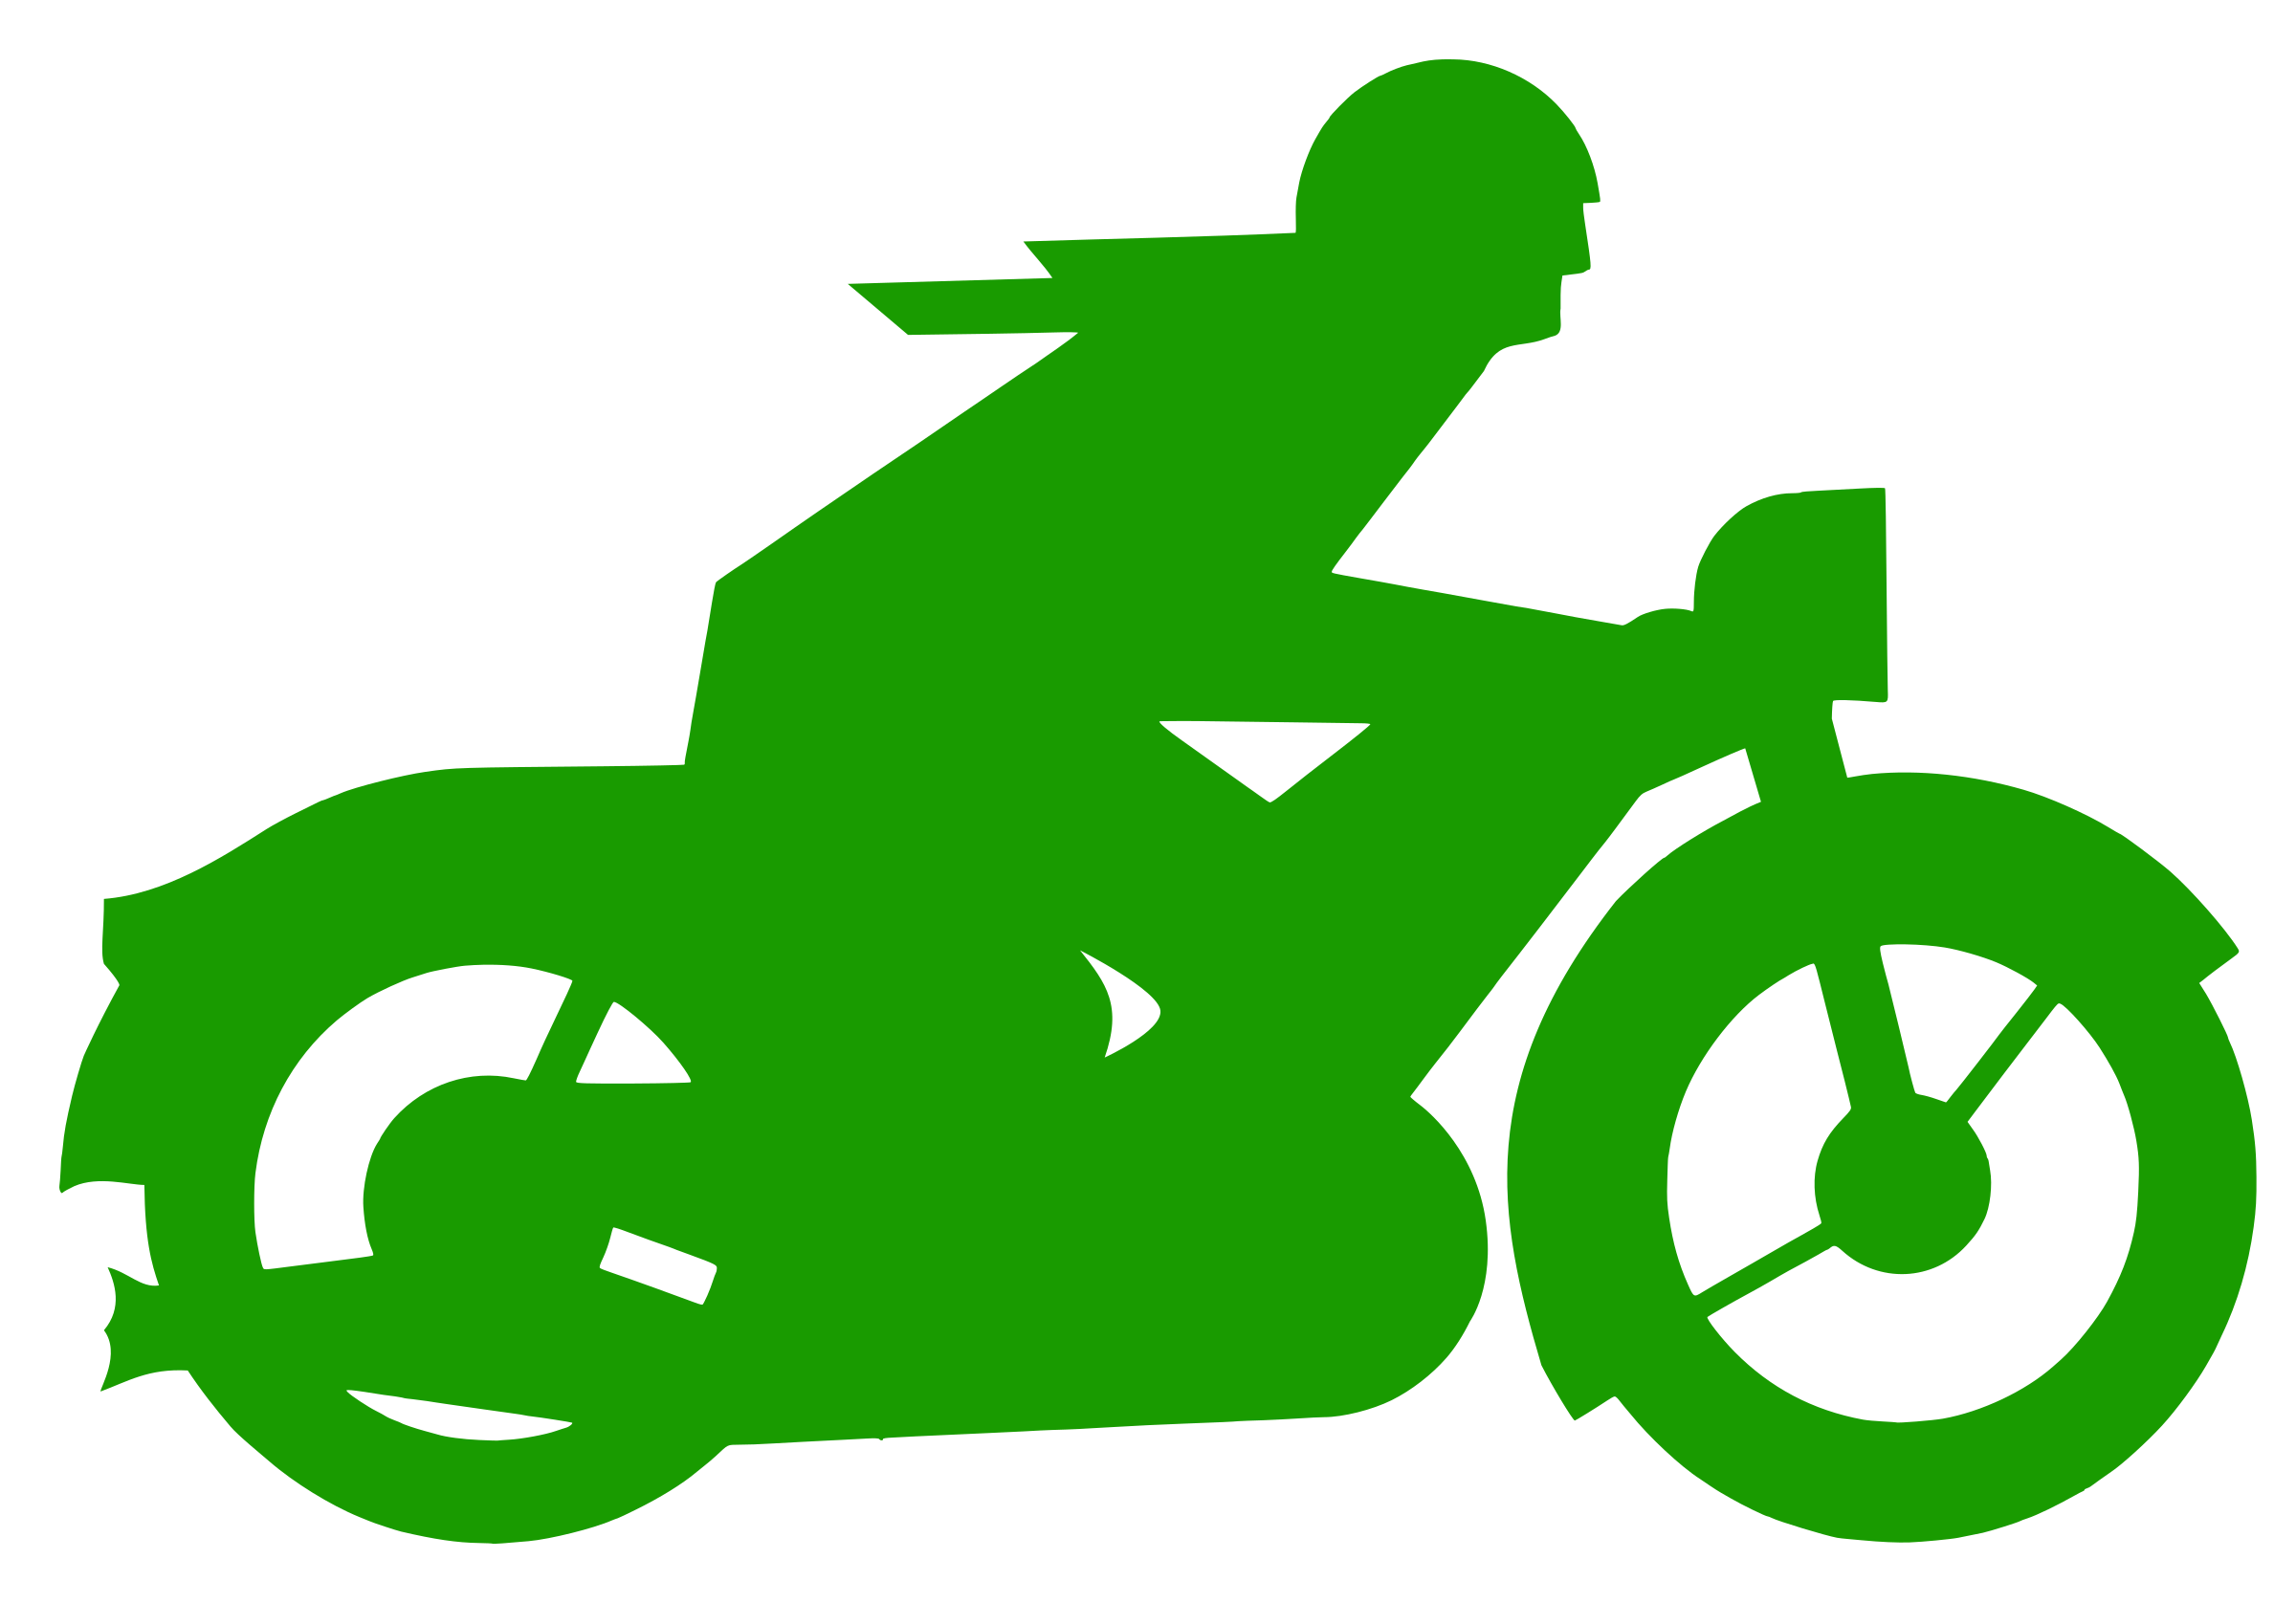 Green clipart motorbike. Motorbiker big image png